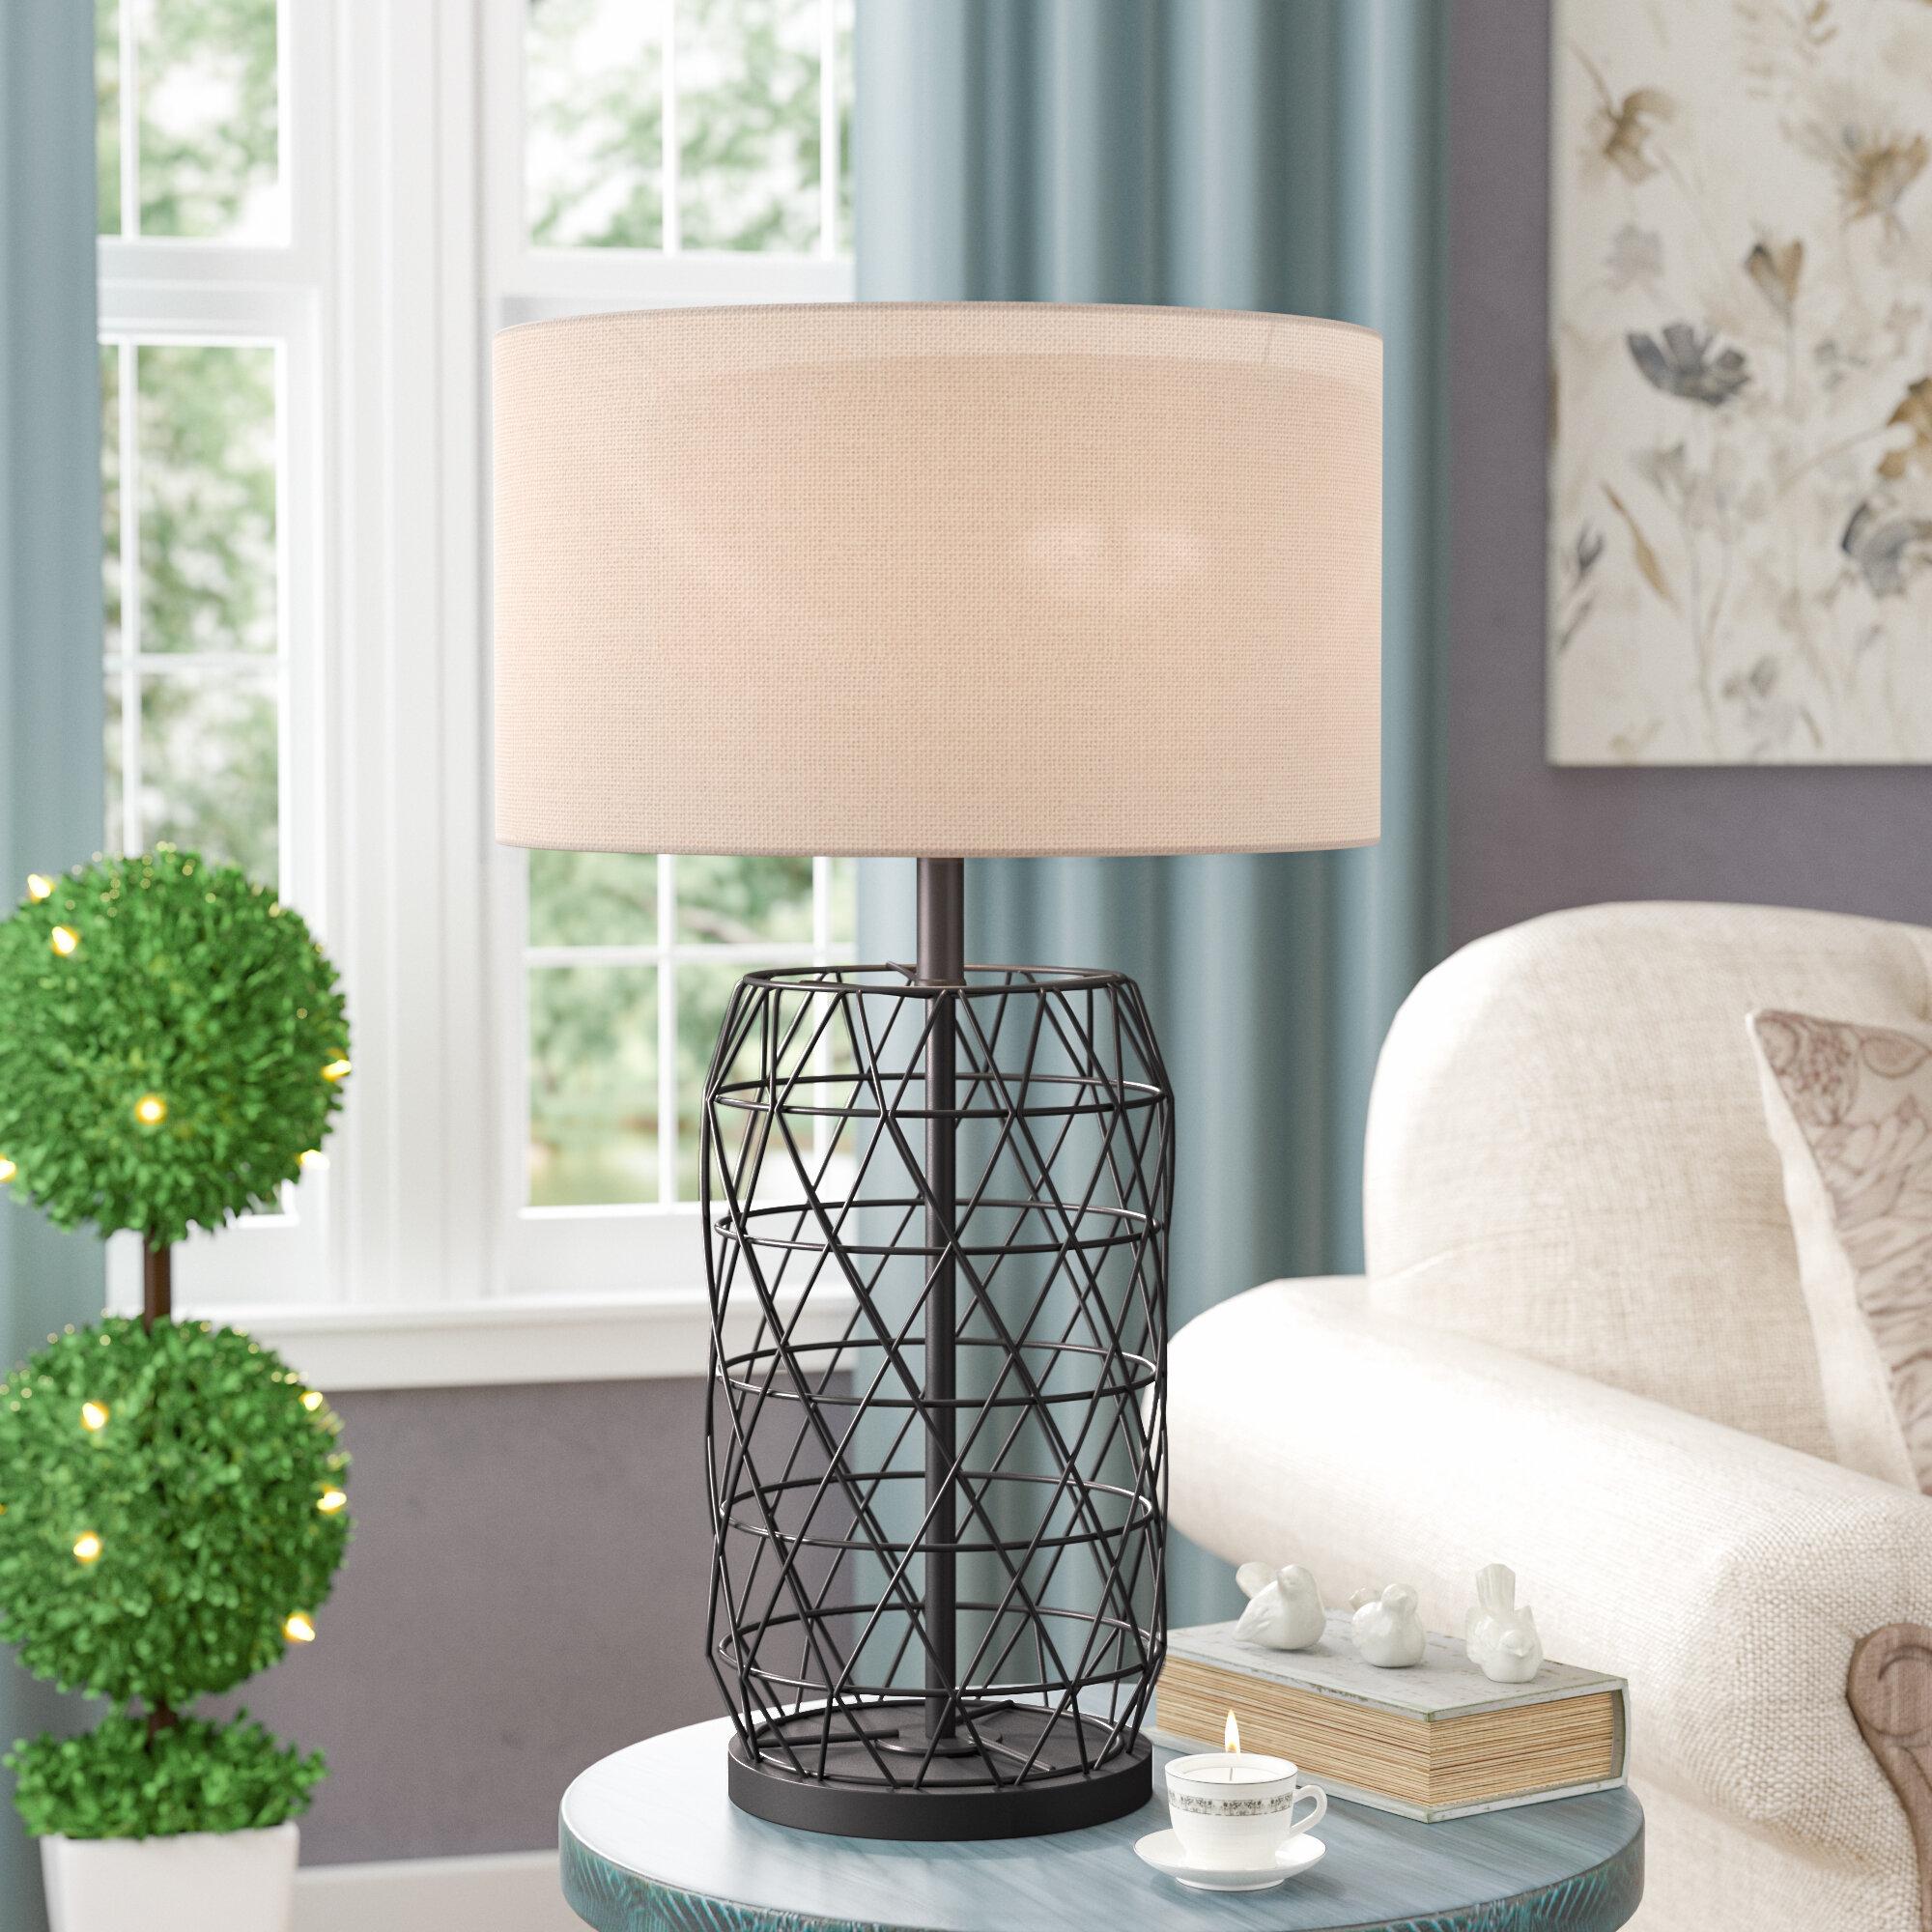 Laurel Foundry Modern Farmhouse Hershel 27 Table Lamp Reviews Wayfair